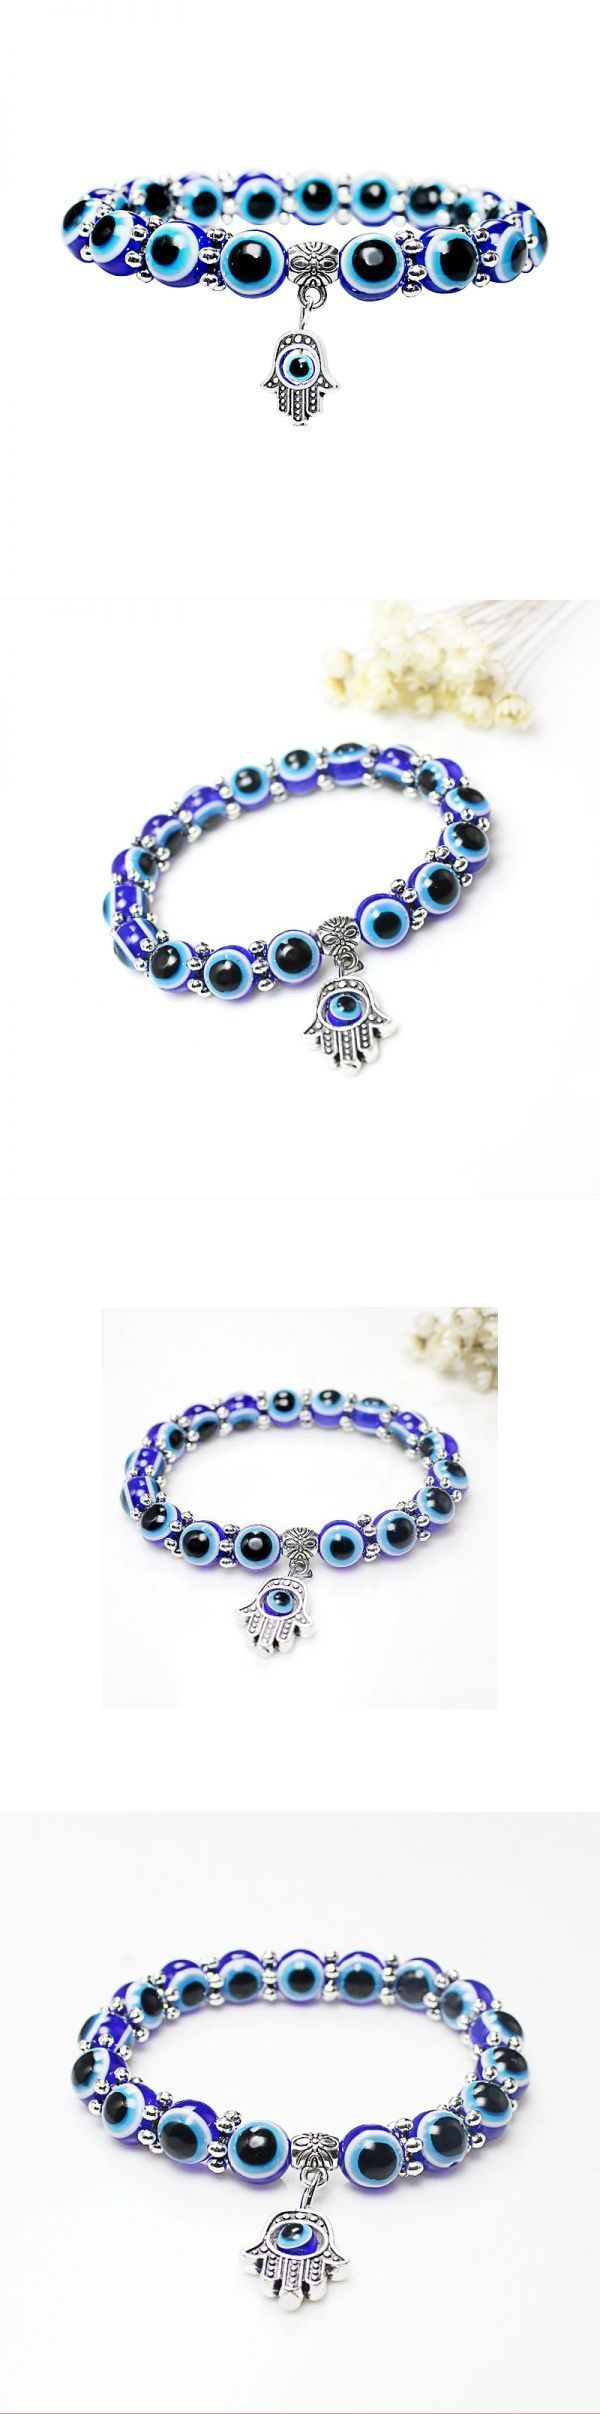 Bracelets john hardy vintage resin fatima hand blue eyes beads trendy elastic bracelet  for women #7 #chakra #bracelets #bracelets #qvc #isabella #m #bracelets #quinceanera #bracelets